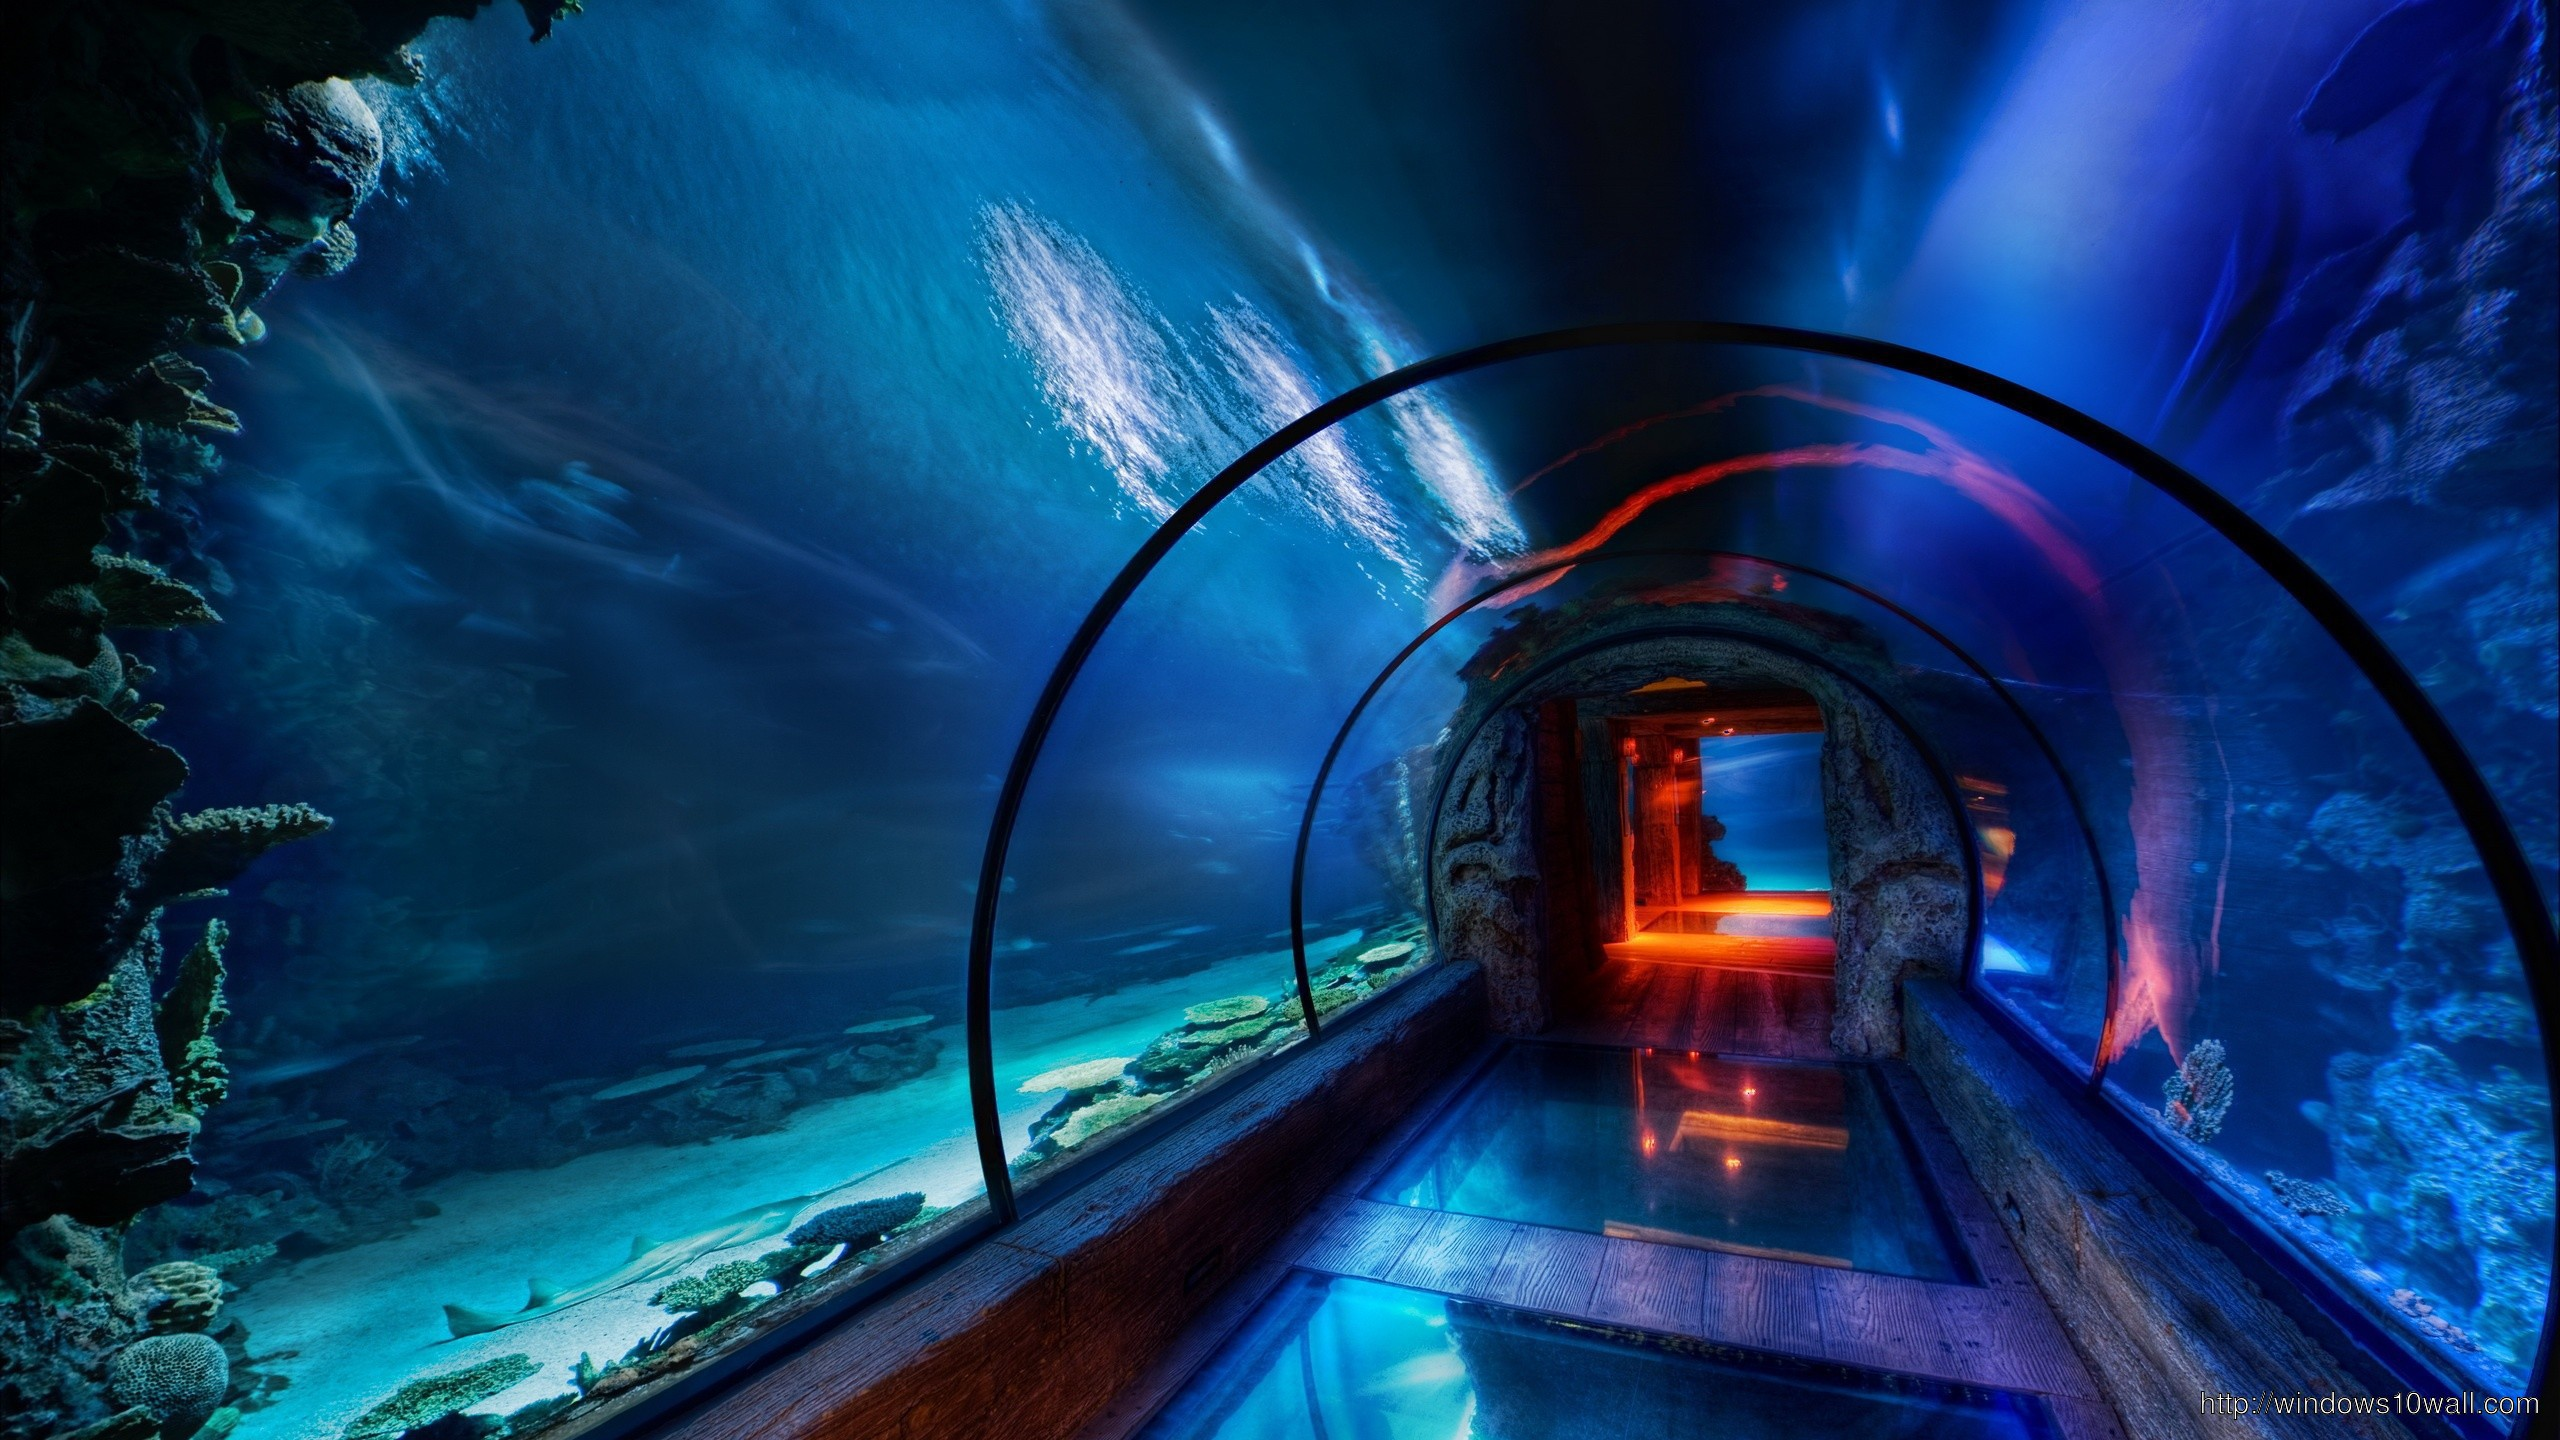 Underwater Tunnel1 Wallpaper Windows 10 Wallpapers